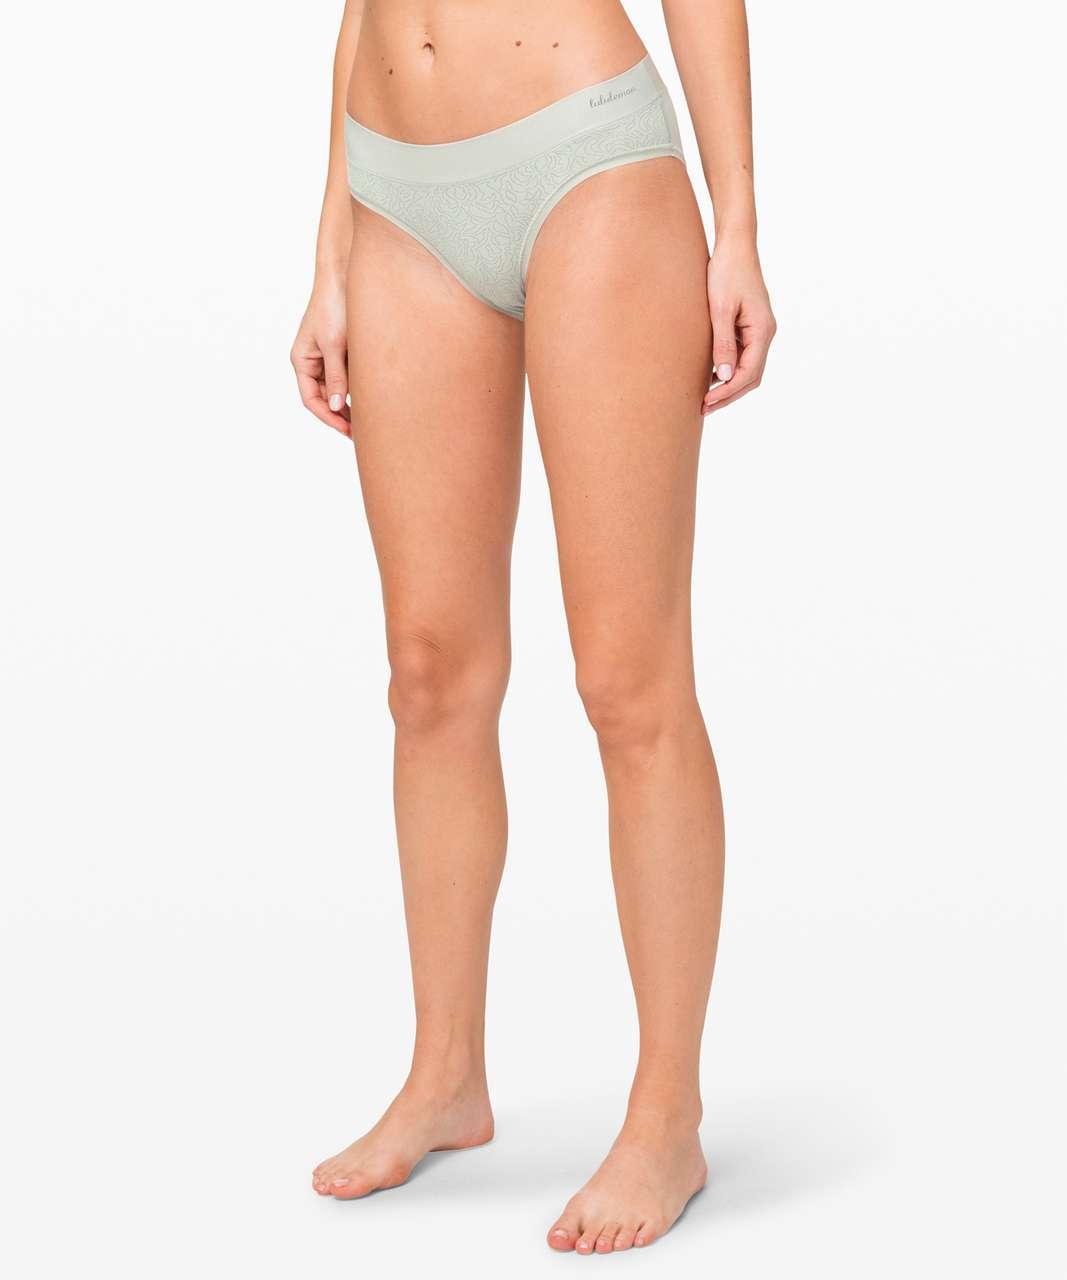 Lululemon Mula Bandhawear Bikini *Lace - Jade Grey